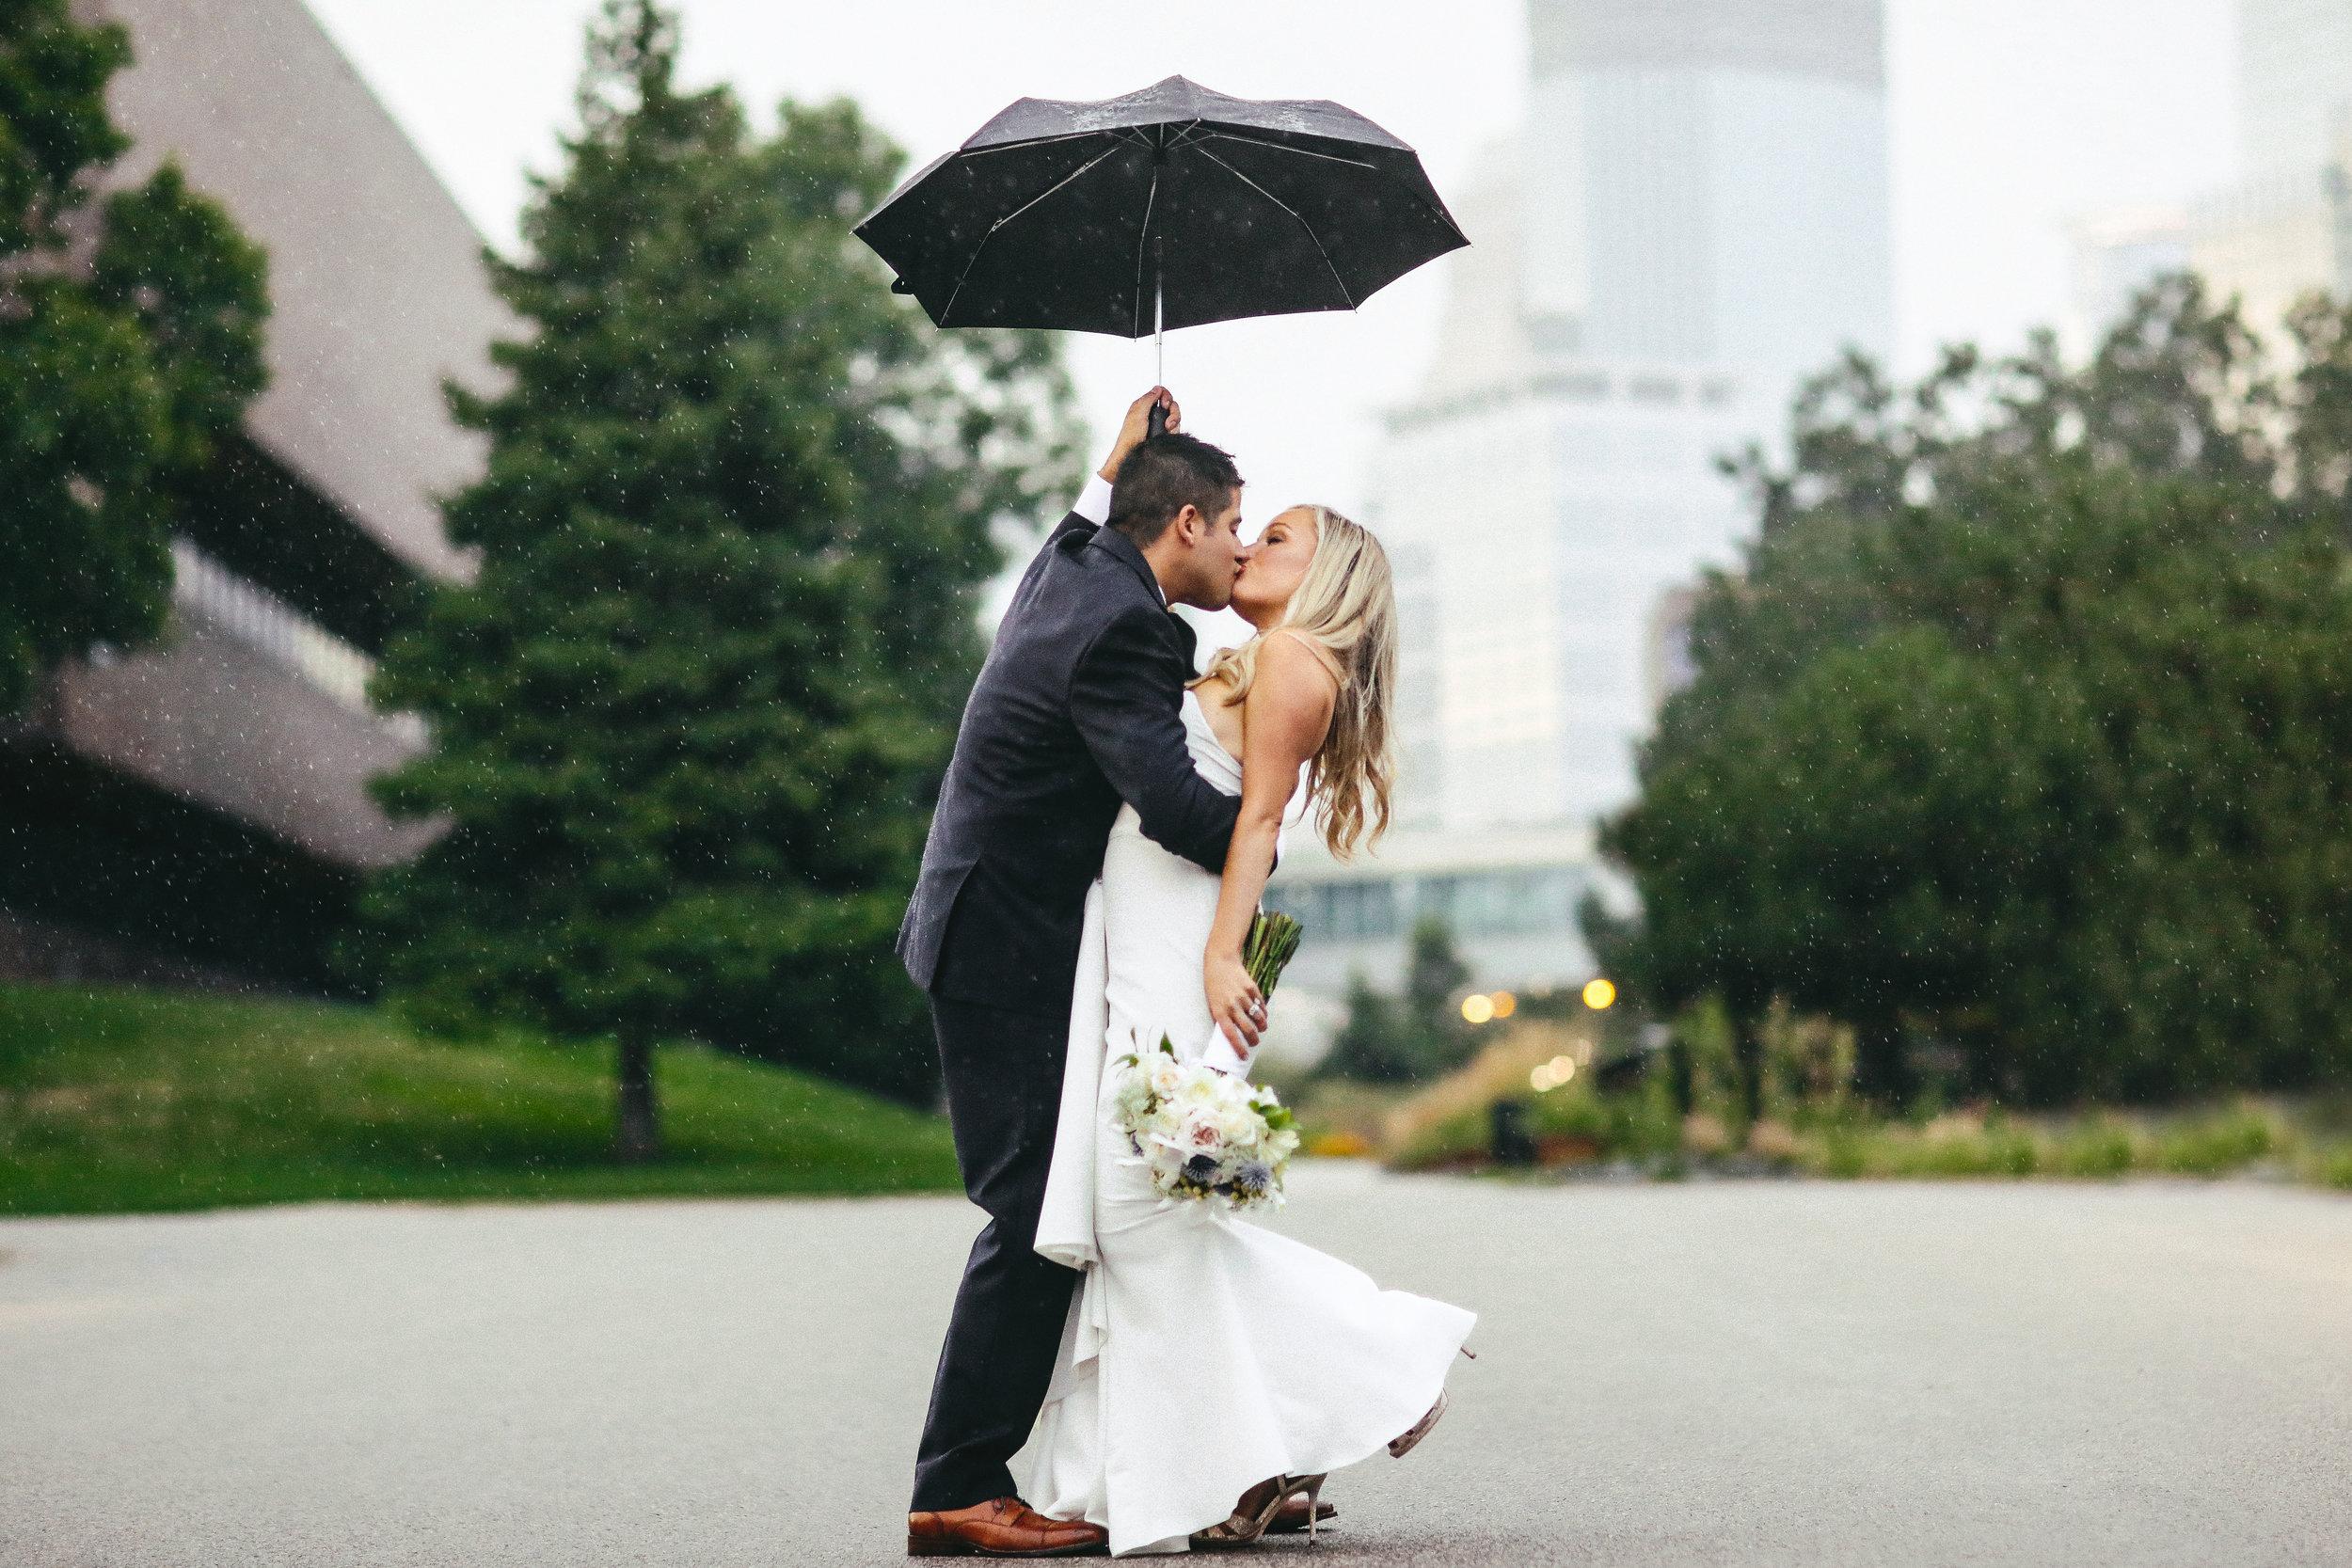 Rainy Downtown Minneapolis Wedding photography